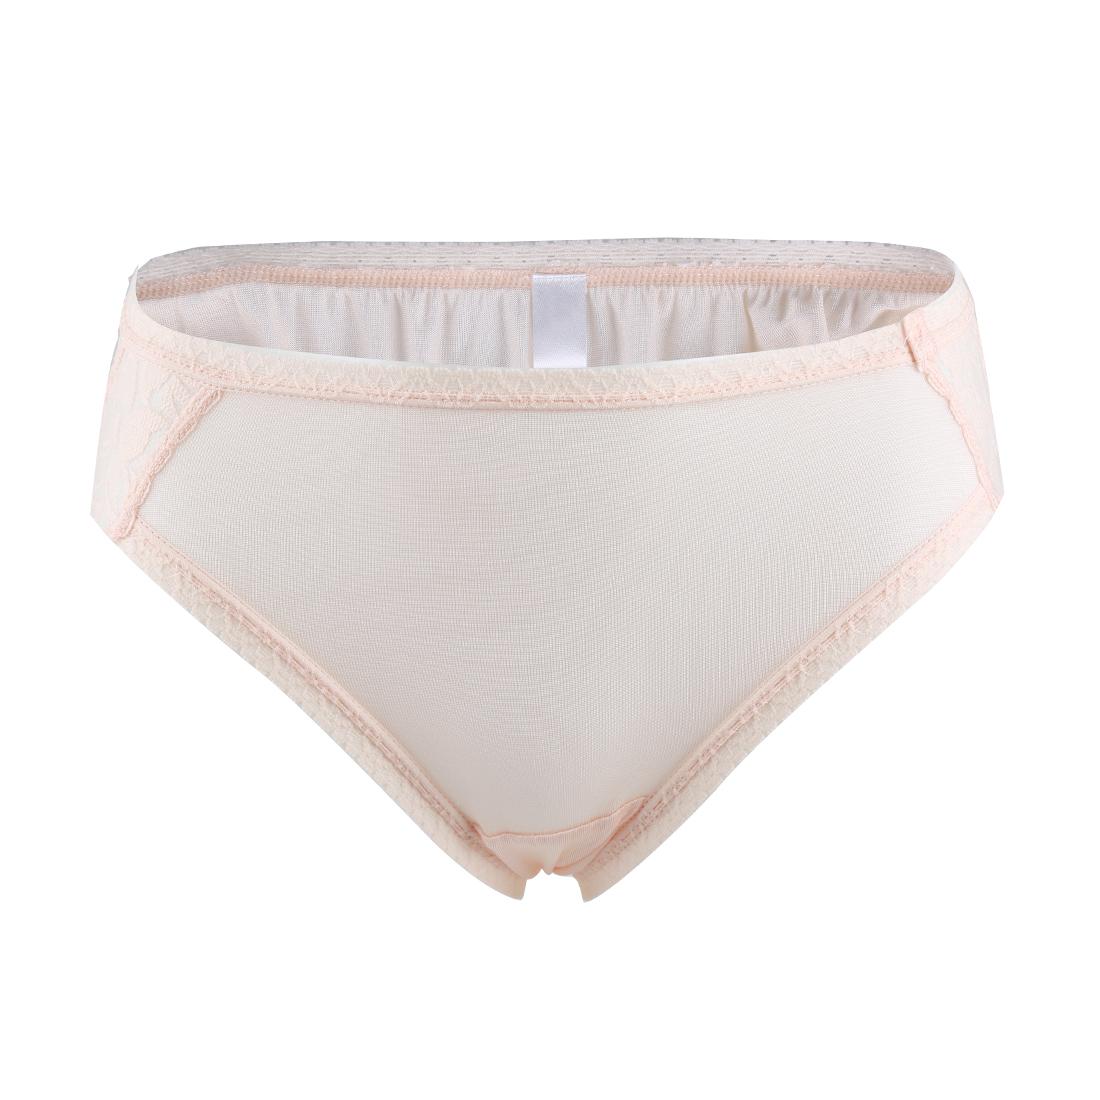 Women Natural Silk Laced Breathable Translucent Hi-Cut Panties Light Pink XLarge